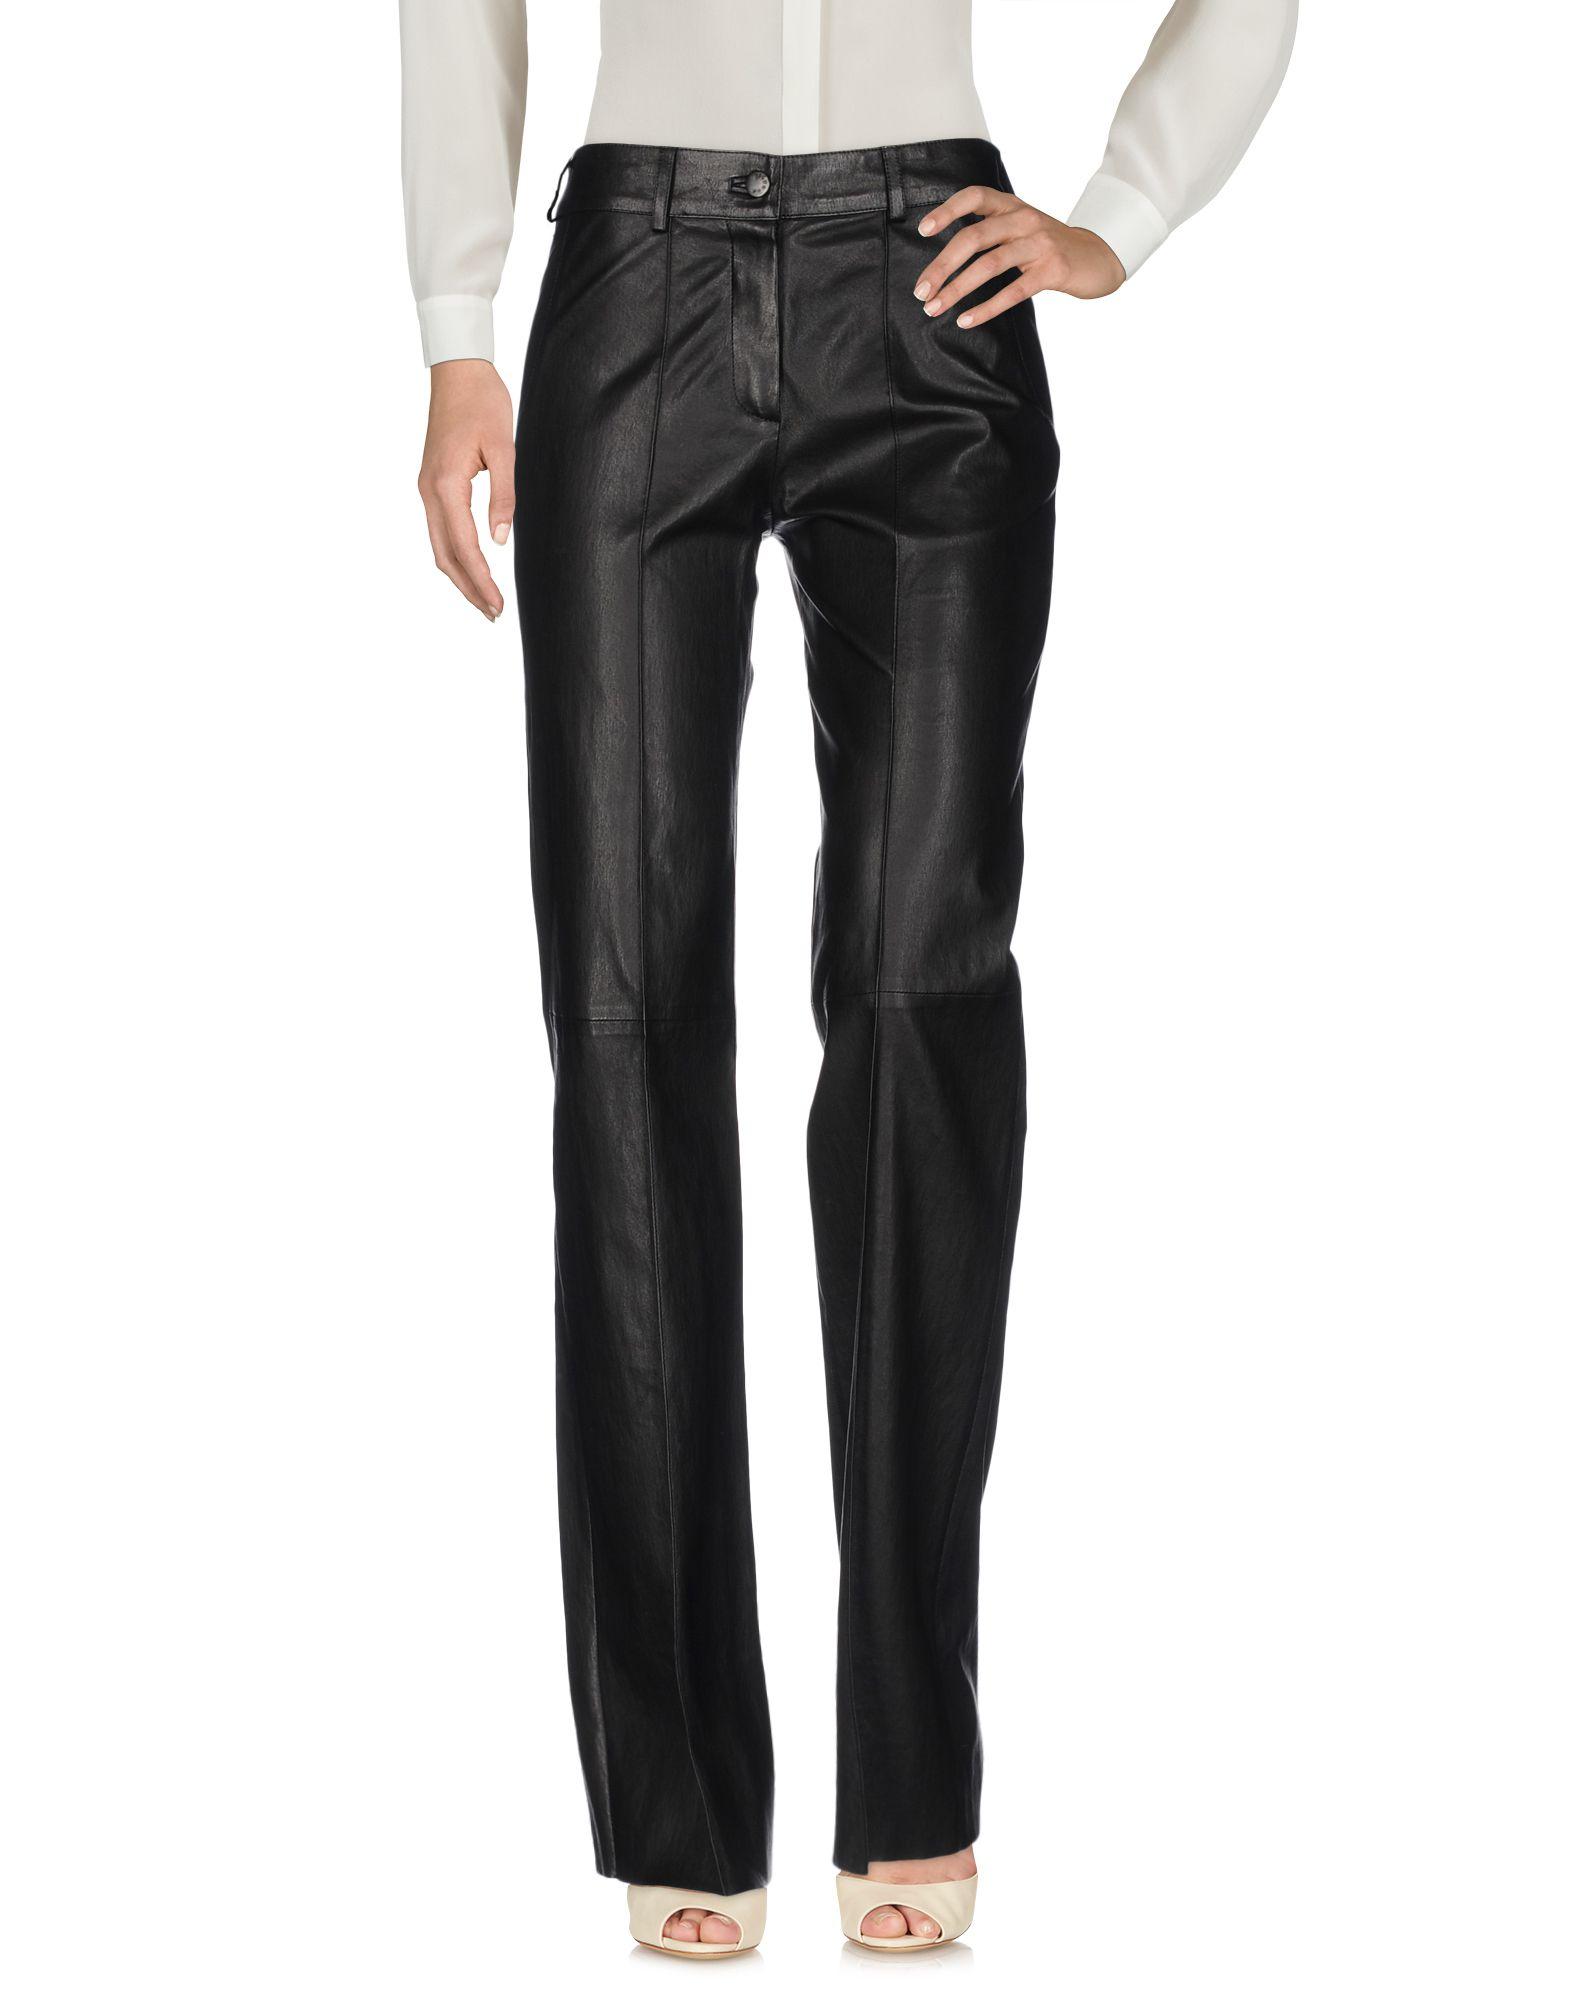 Pantalone Jitrois Donna - Acquista online su JtZ7BQUU